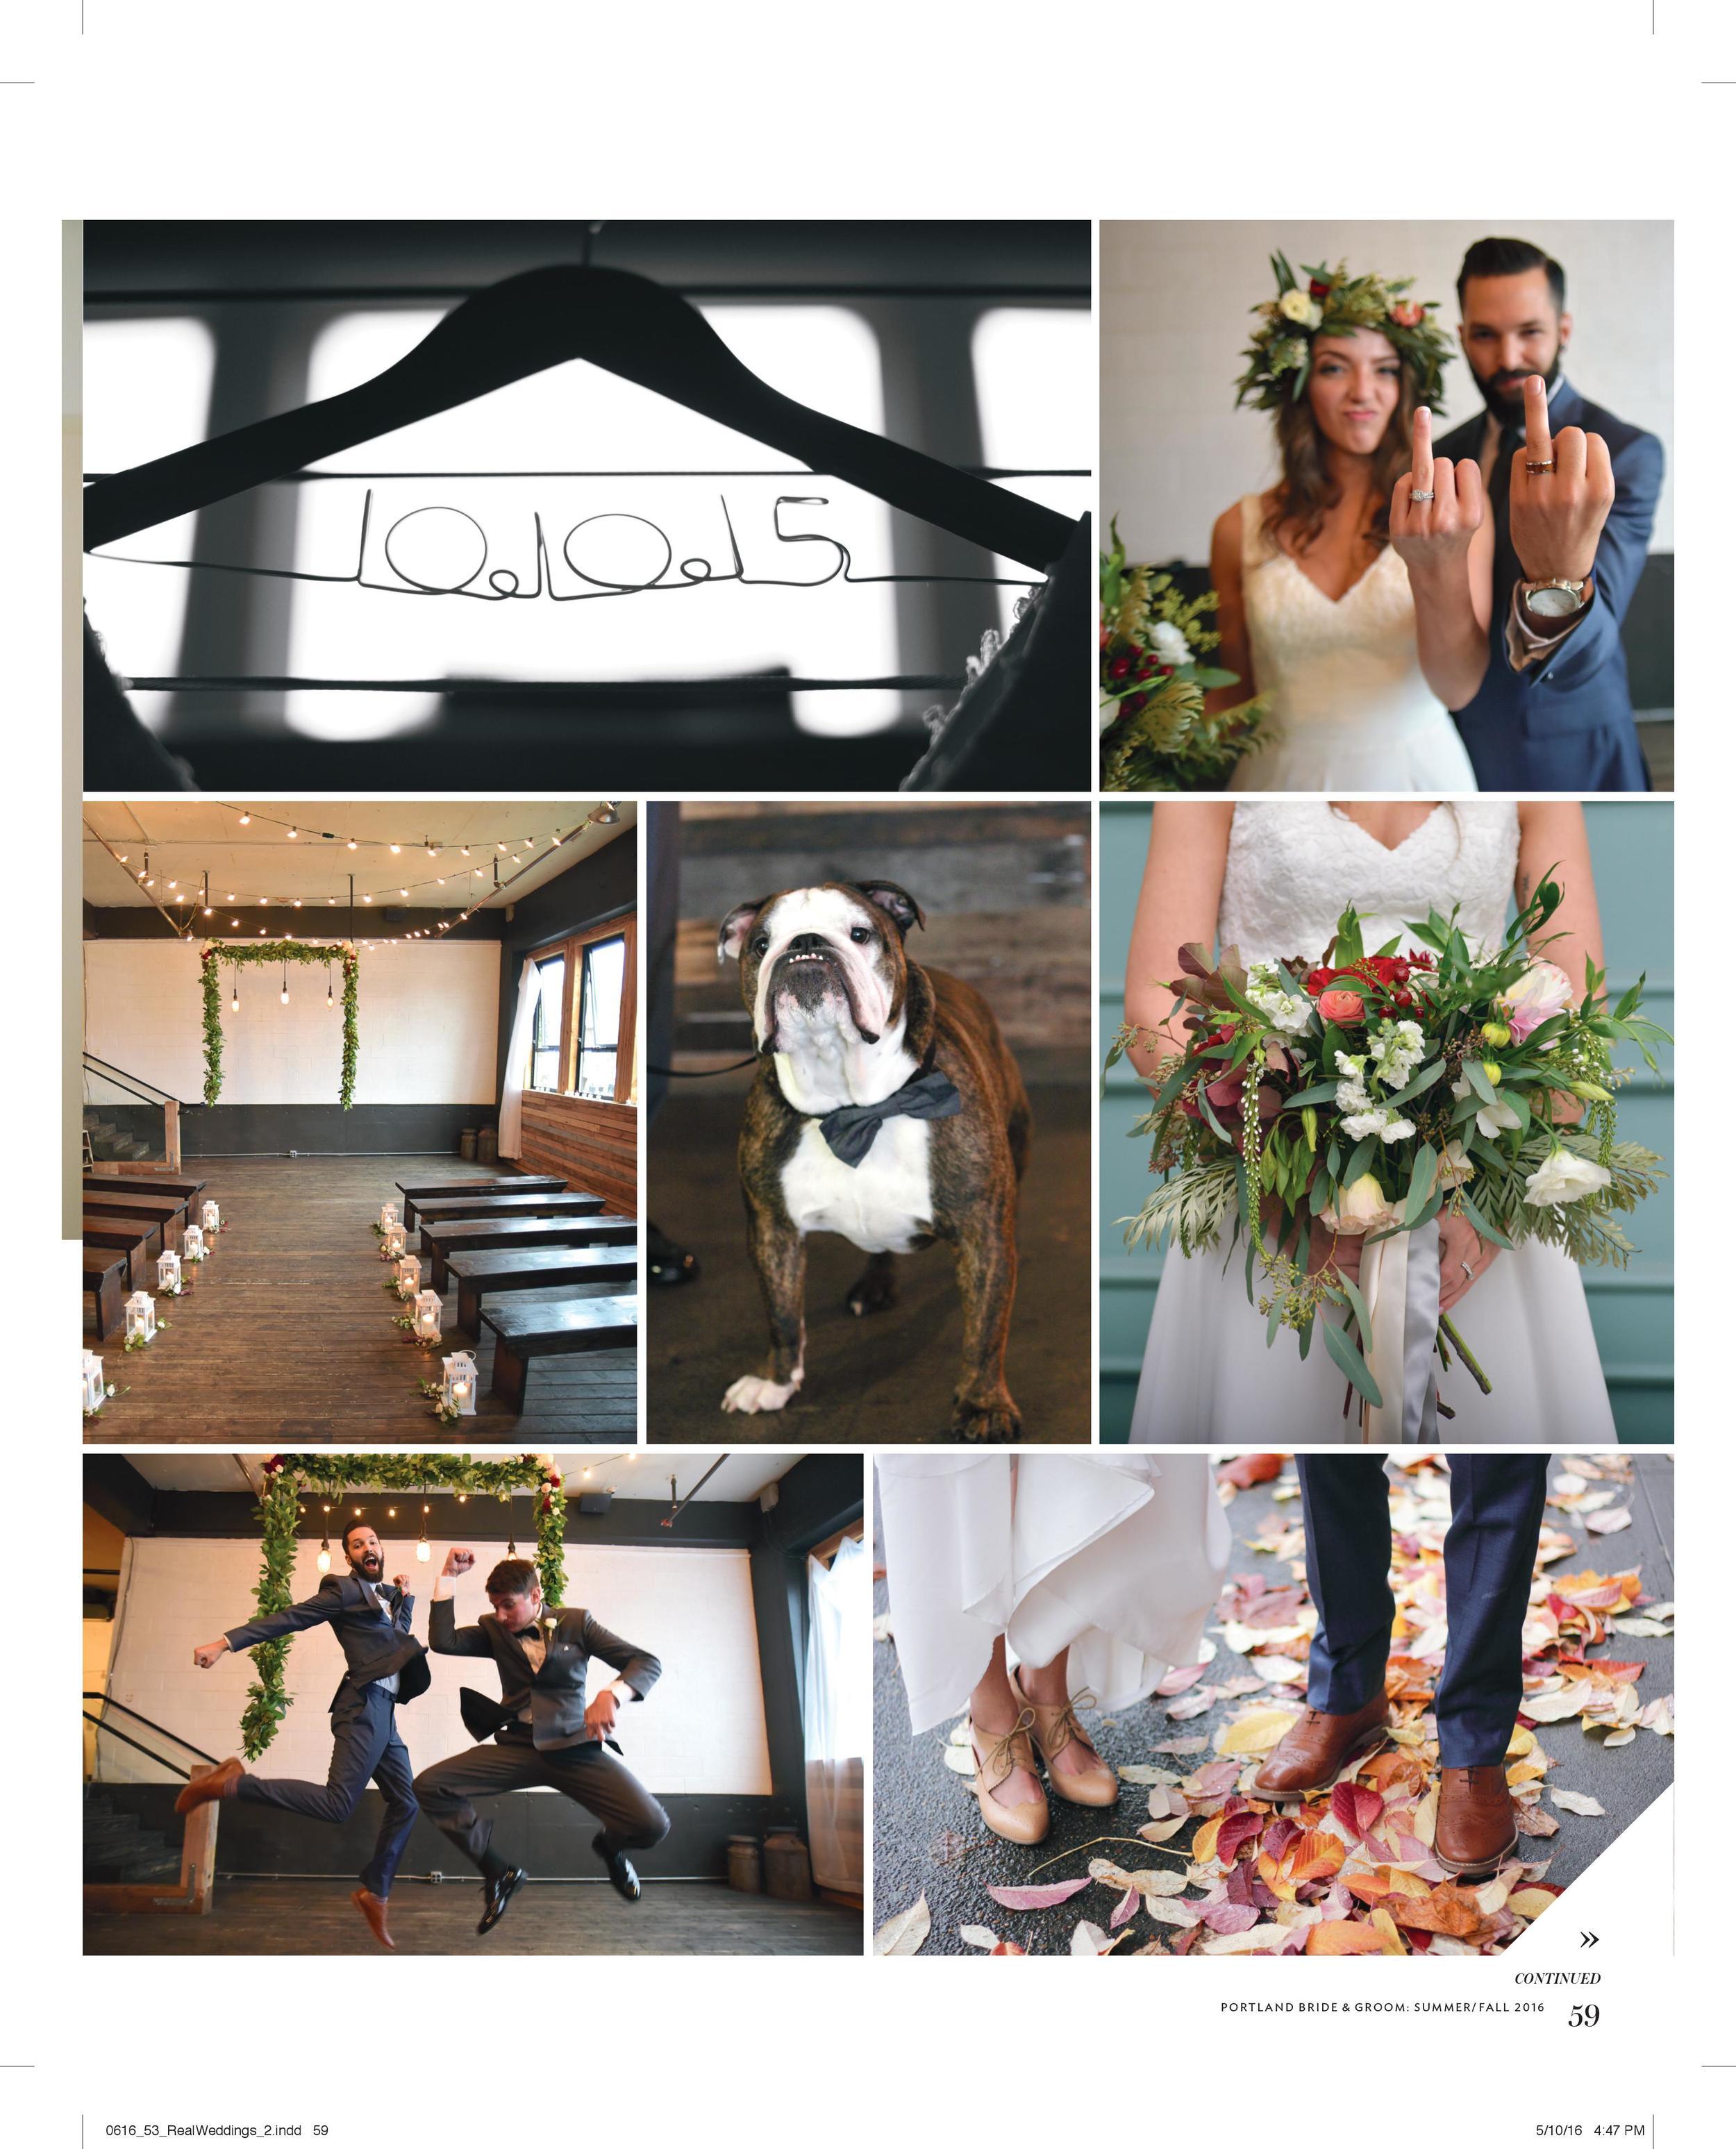 Bridalbliss.com | Portland Wedding Planner | Oregon Event Design